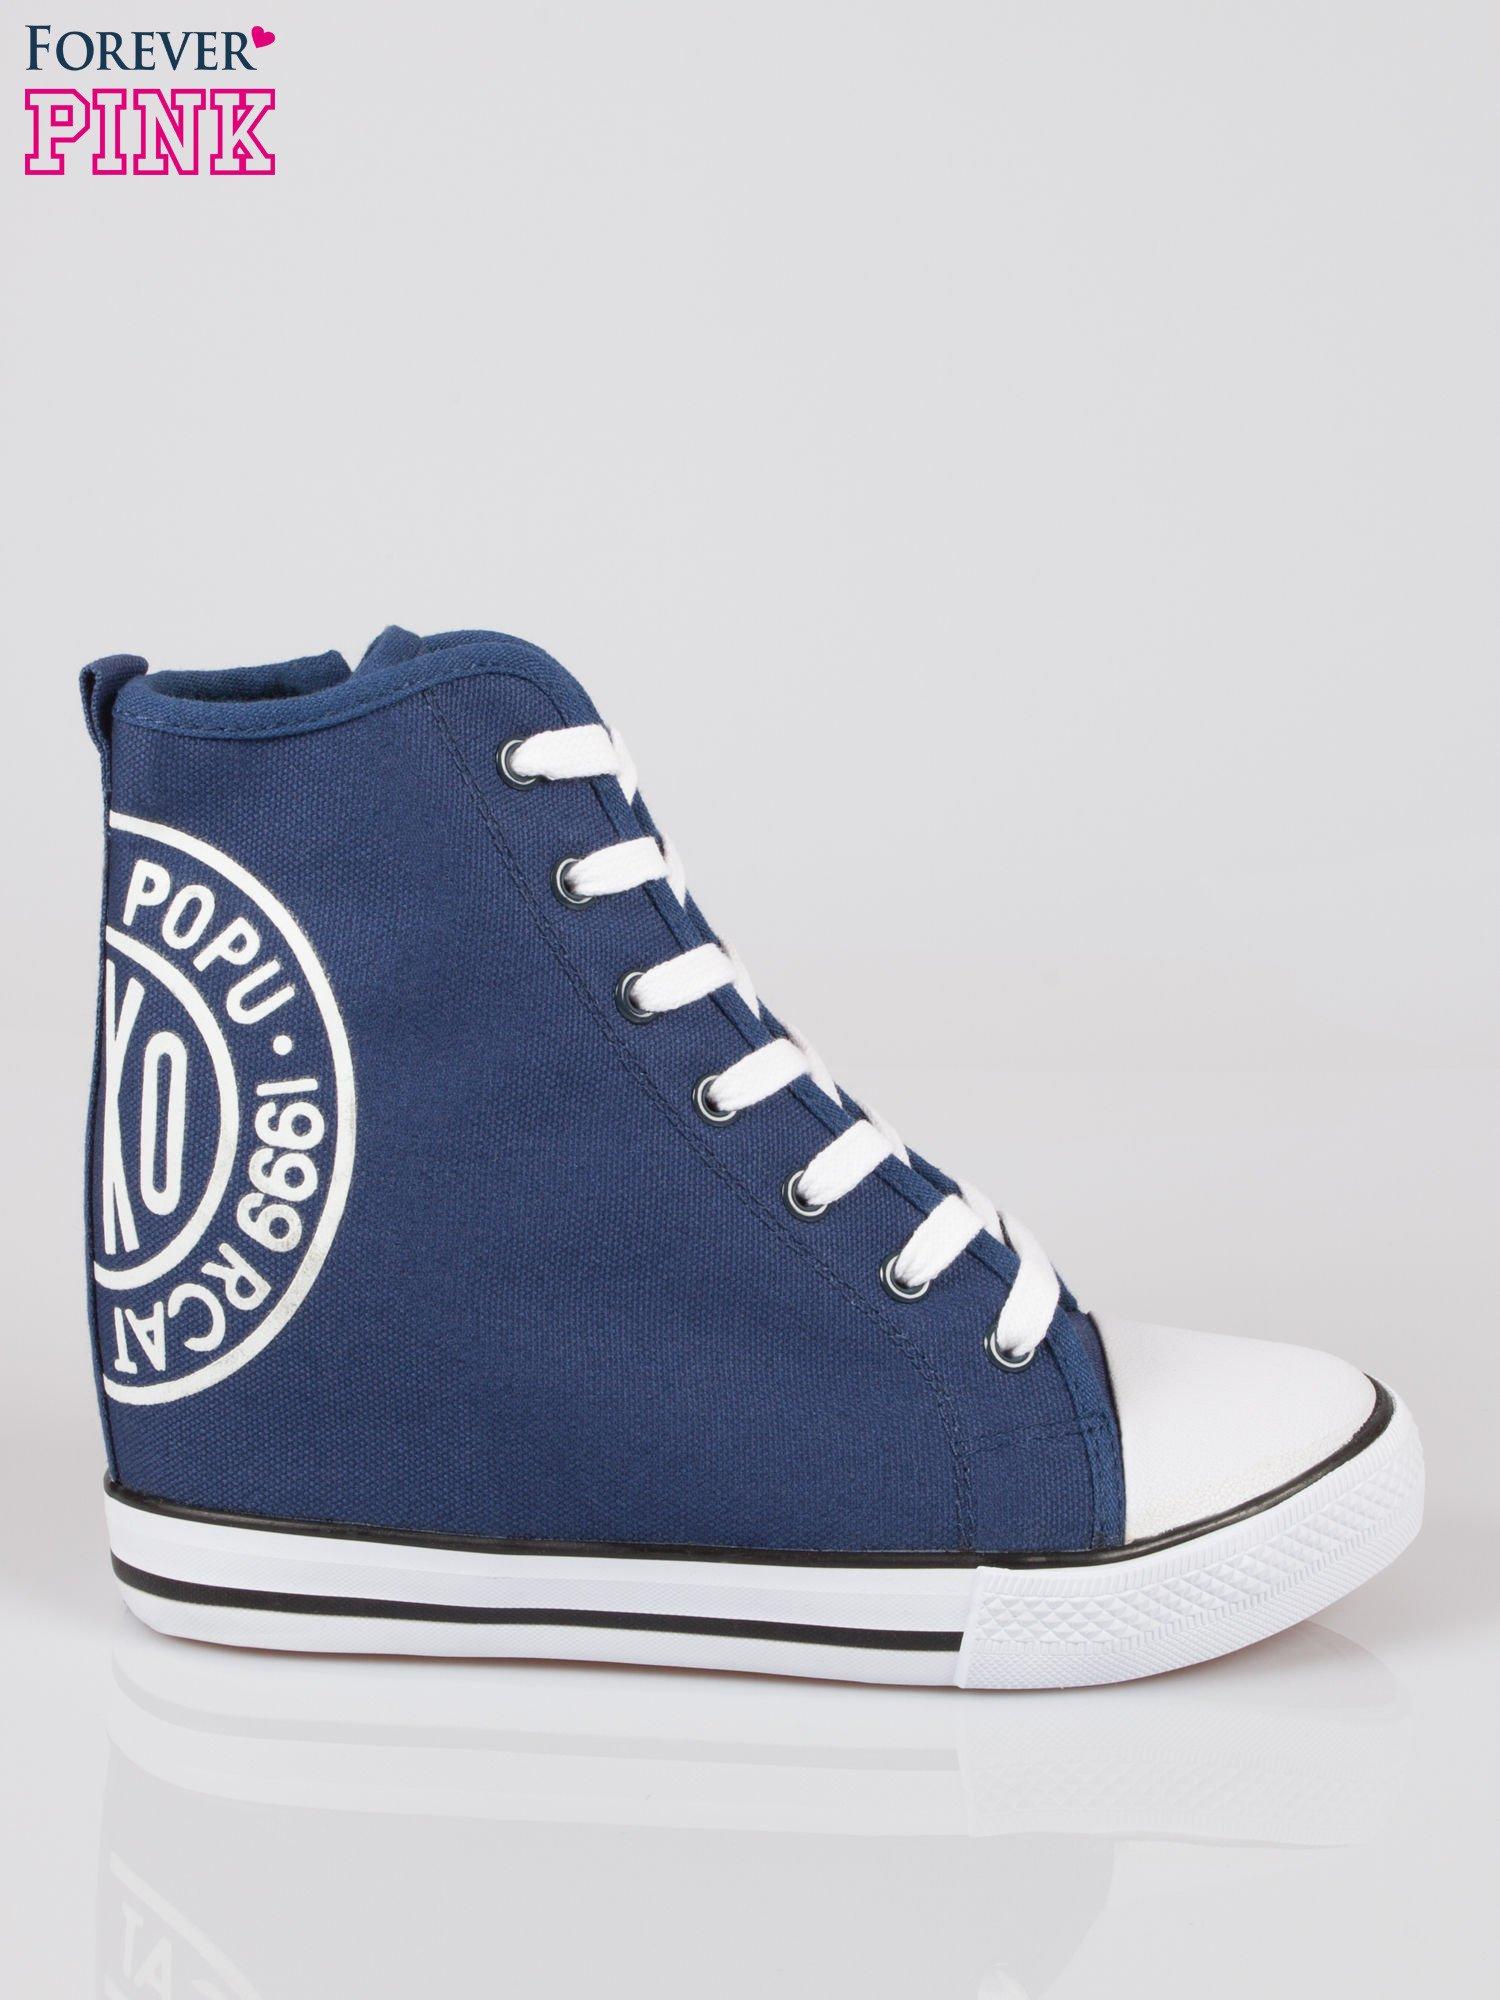 Granatowe trampki na koturnie sneakersy z logo                                  zdj.                                  1